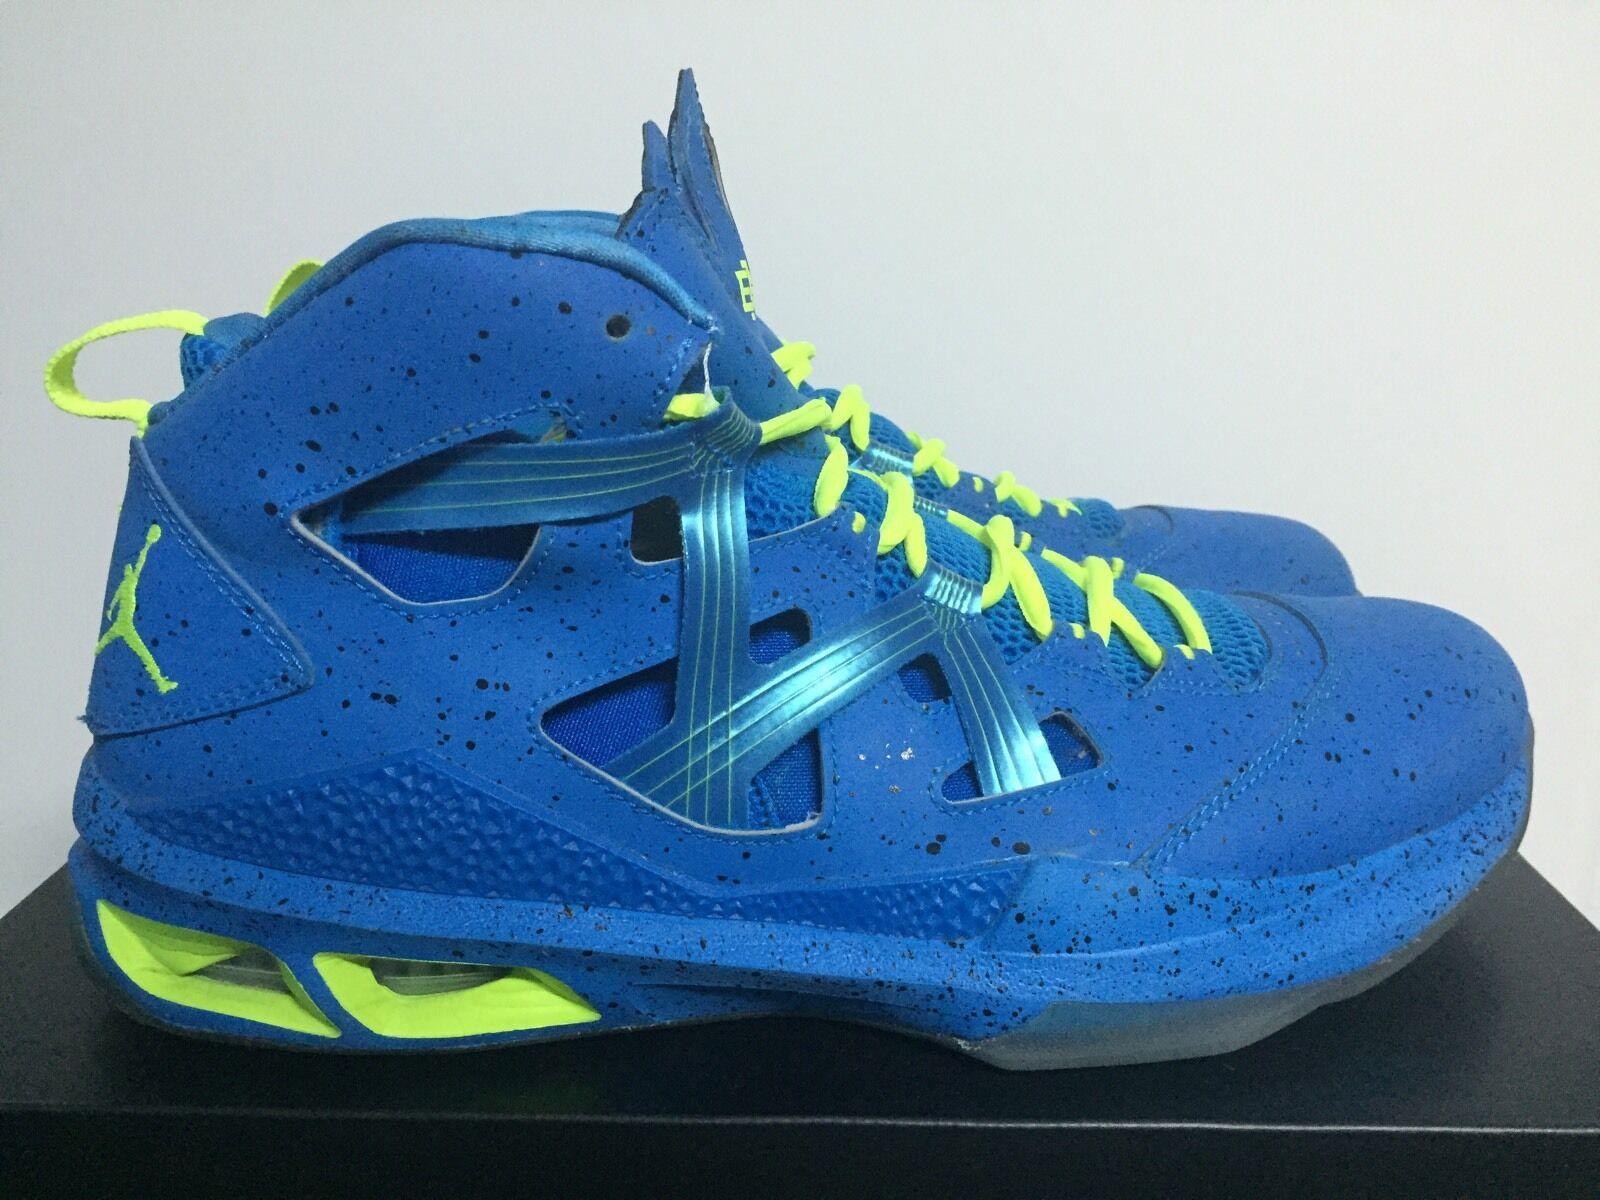 Nike Jordan Melo Kobe 9 BHM US 10,5 Kobe Melo Hyper Max Curry Harden Lebron Kyrie KD CP3 361673